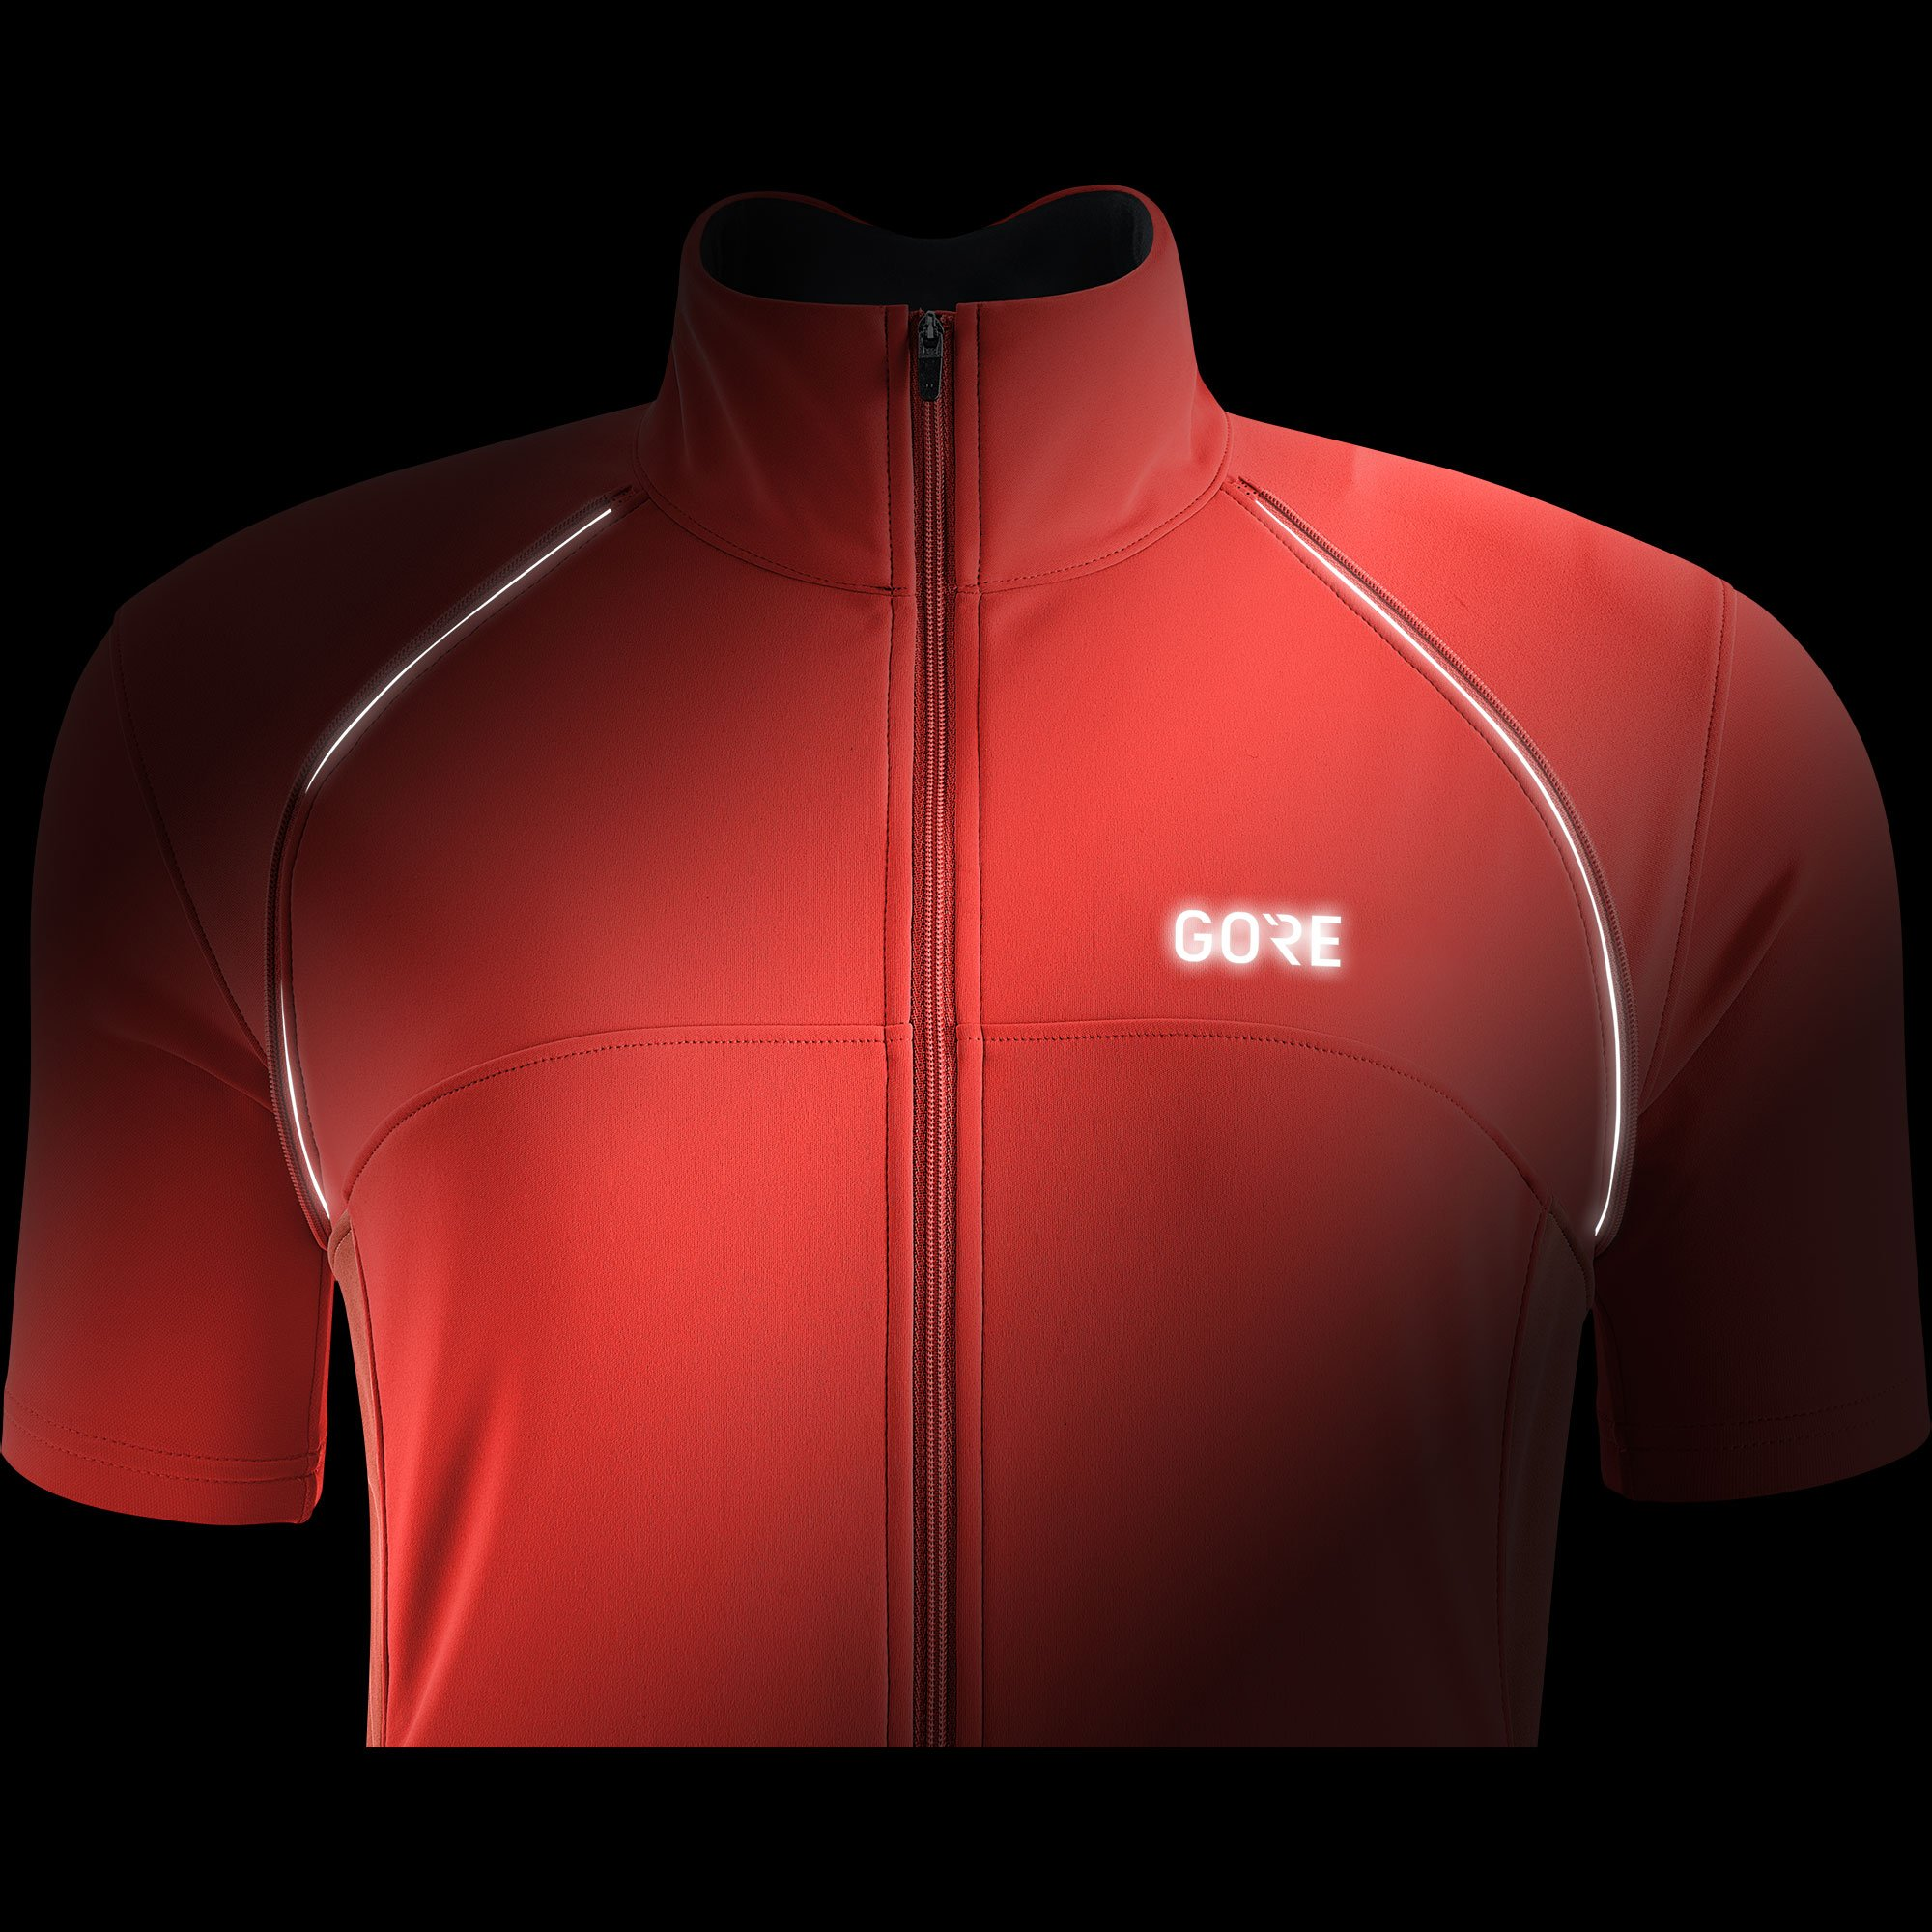 GORE Wear Women's Windproof Cycling Jacket, Removable Sleeves, GORE Wear C3 Women's GORE Wear WINDSTOPPER Phantom Zip-Off Jacket, Size: M, Color: Lumi Orange/Coral Glow, 100191 by GORE WEAR (Image #6)